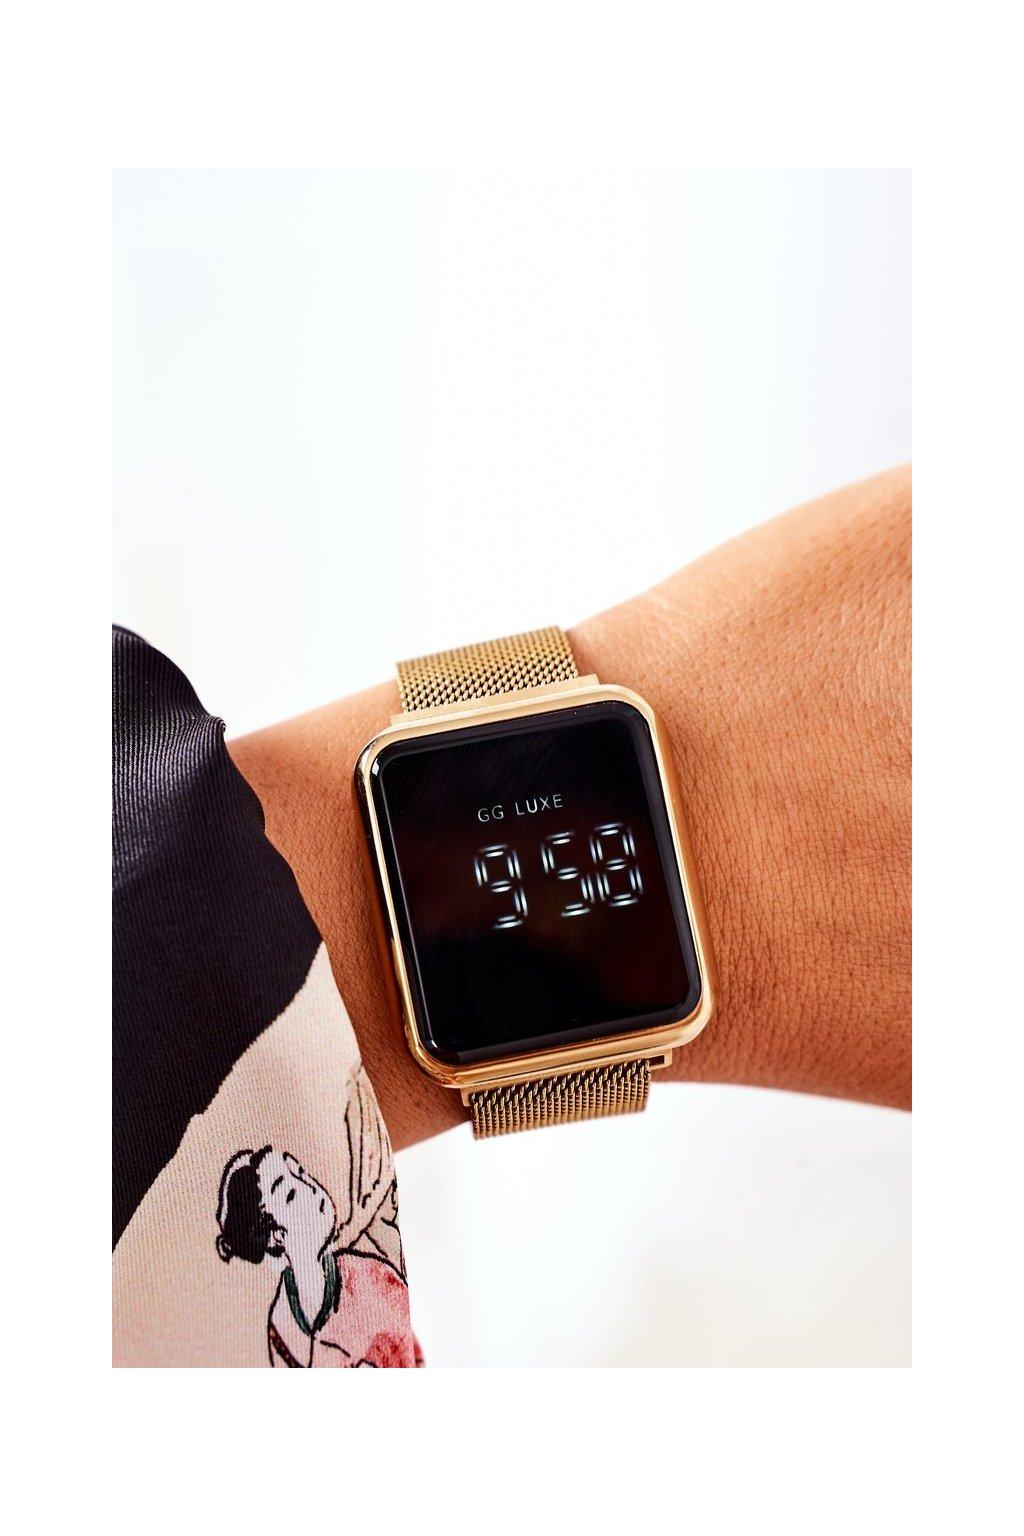 Hodinky farba kód DZ-3388 GOLD